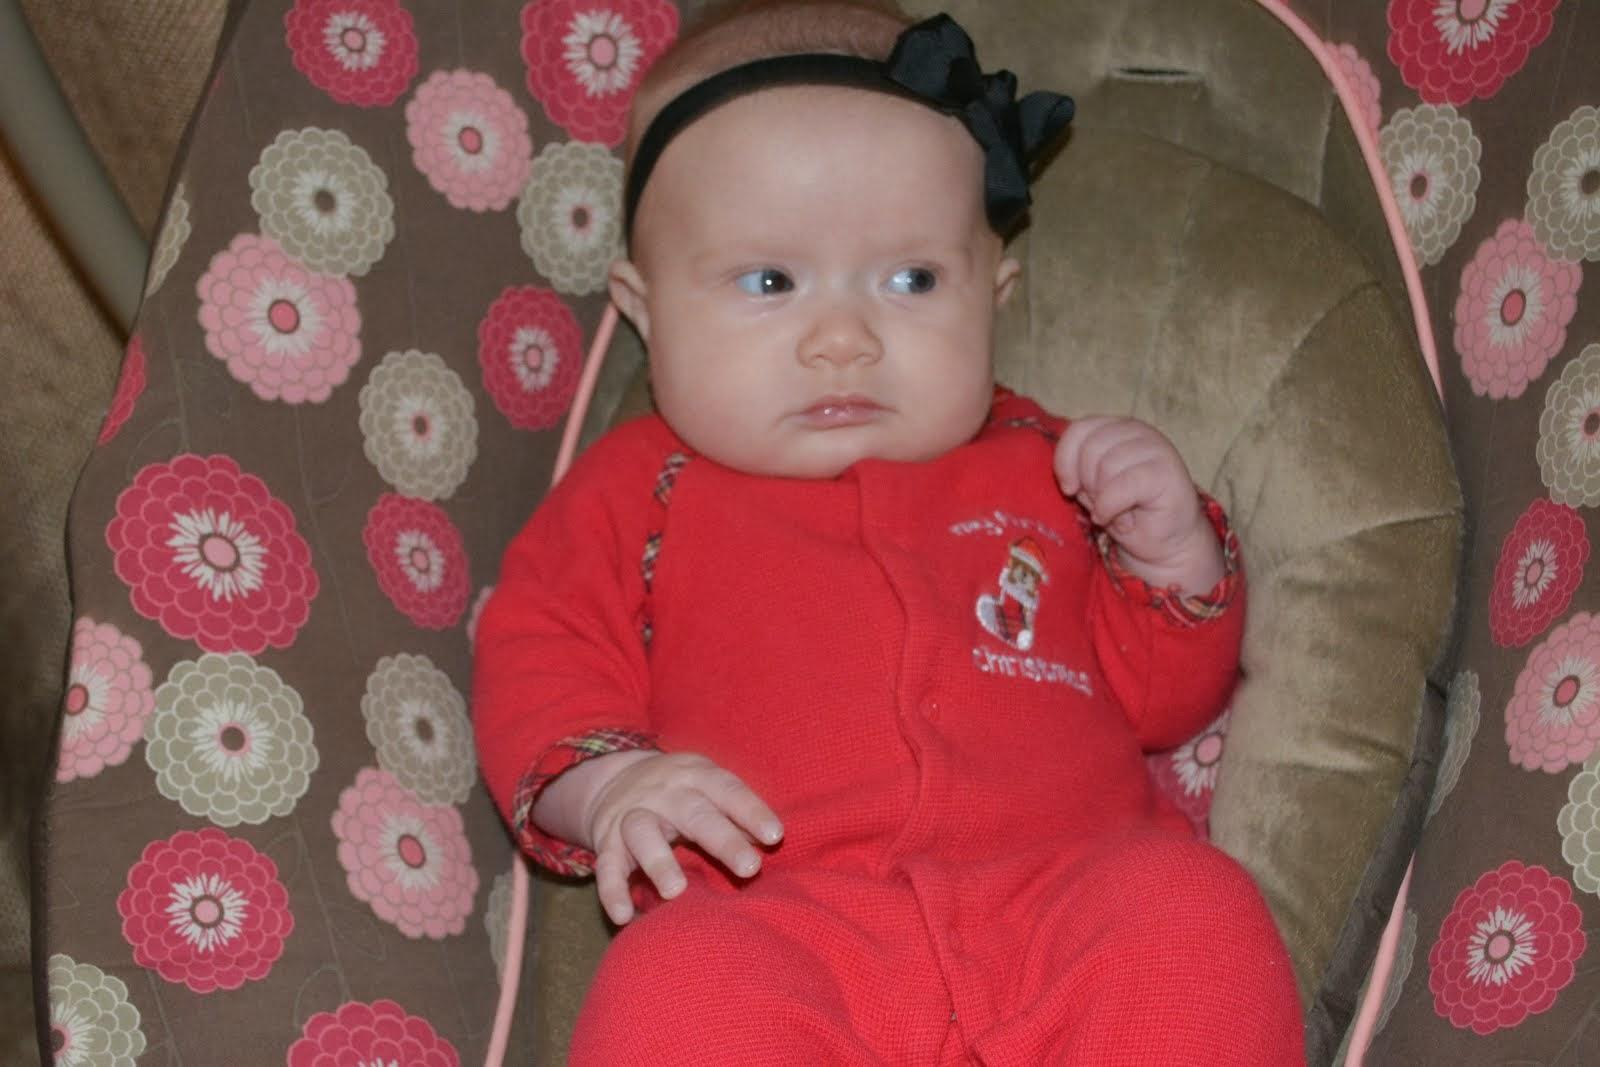 Kayte, 3 months